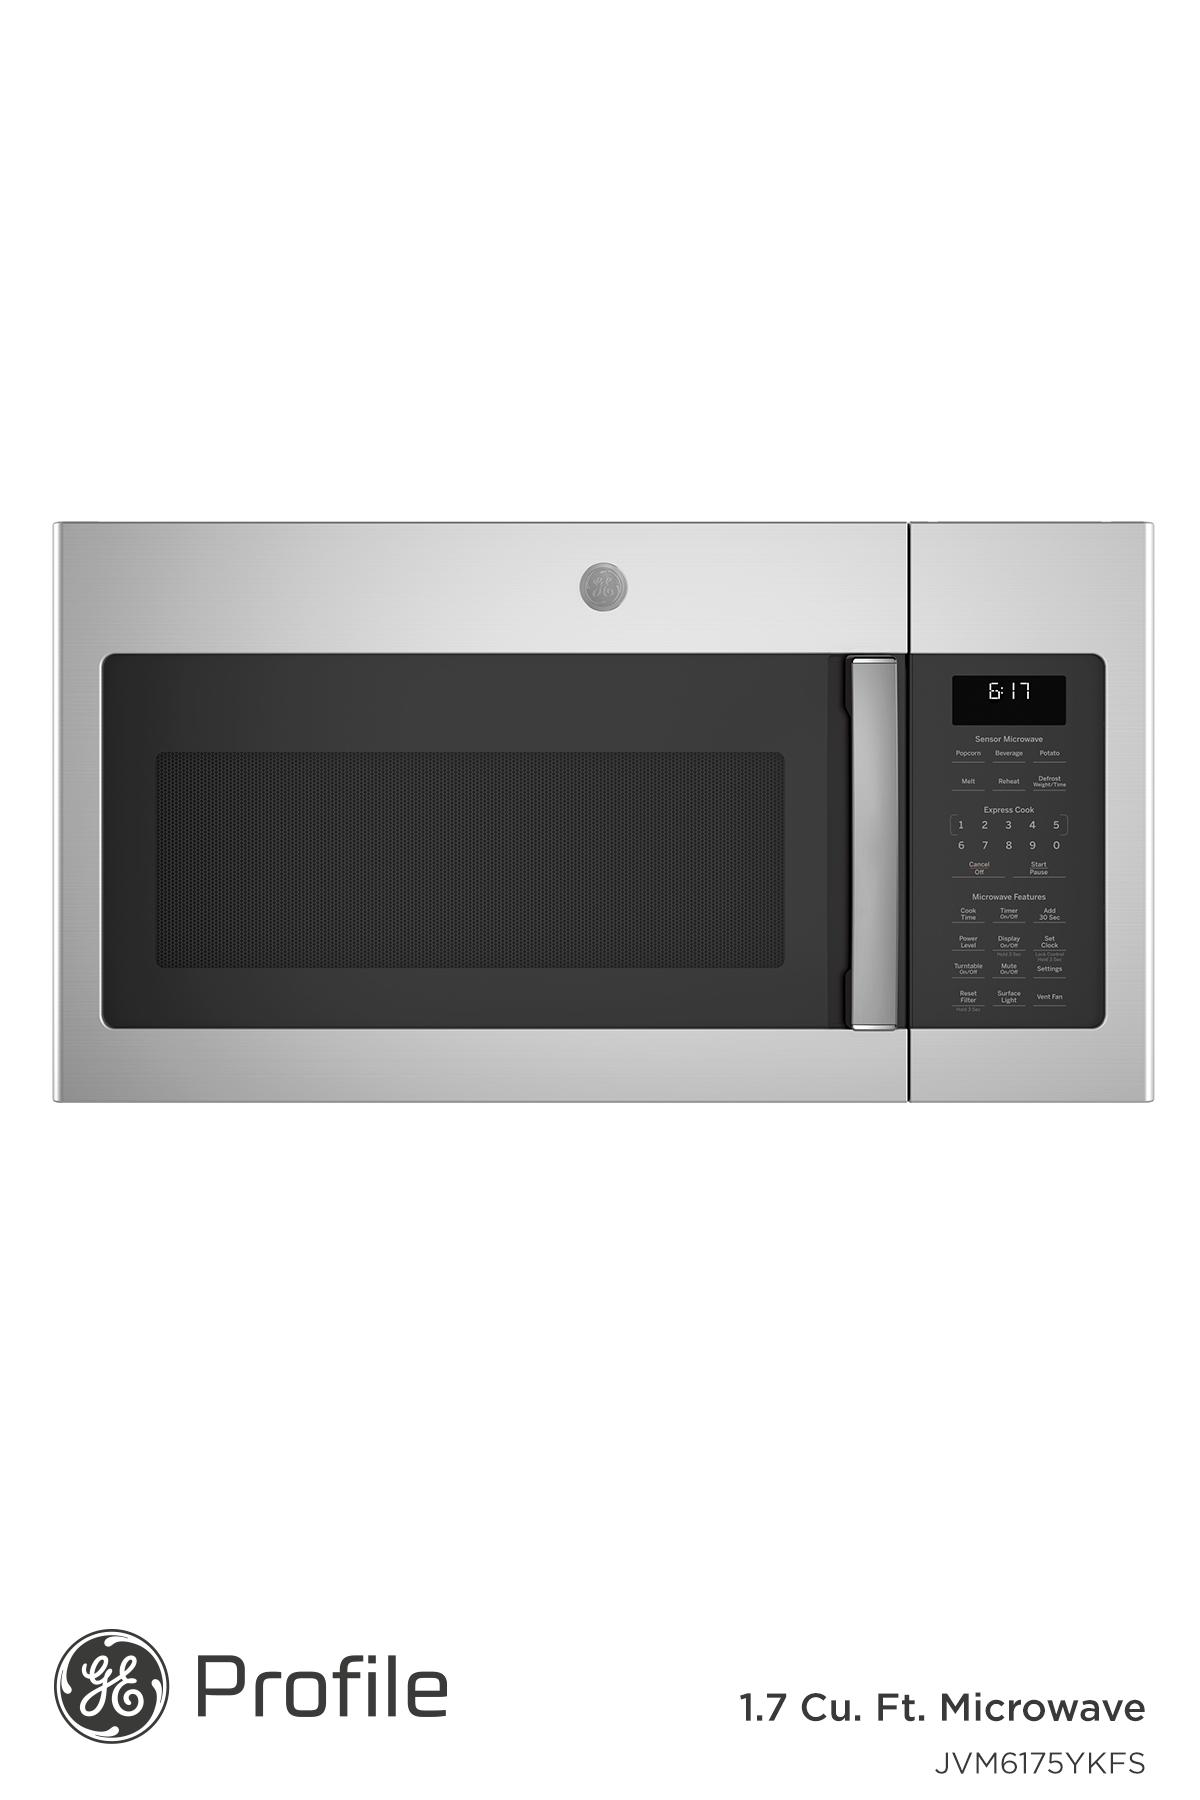 Ge 1 7 Cu Ft Over The Range Sensor Fingerprint Resistant Microwave Oven Jvm6175ykfs In 2020 Appliances Ge Appliances Cool Kitchens